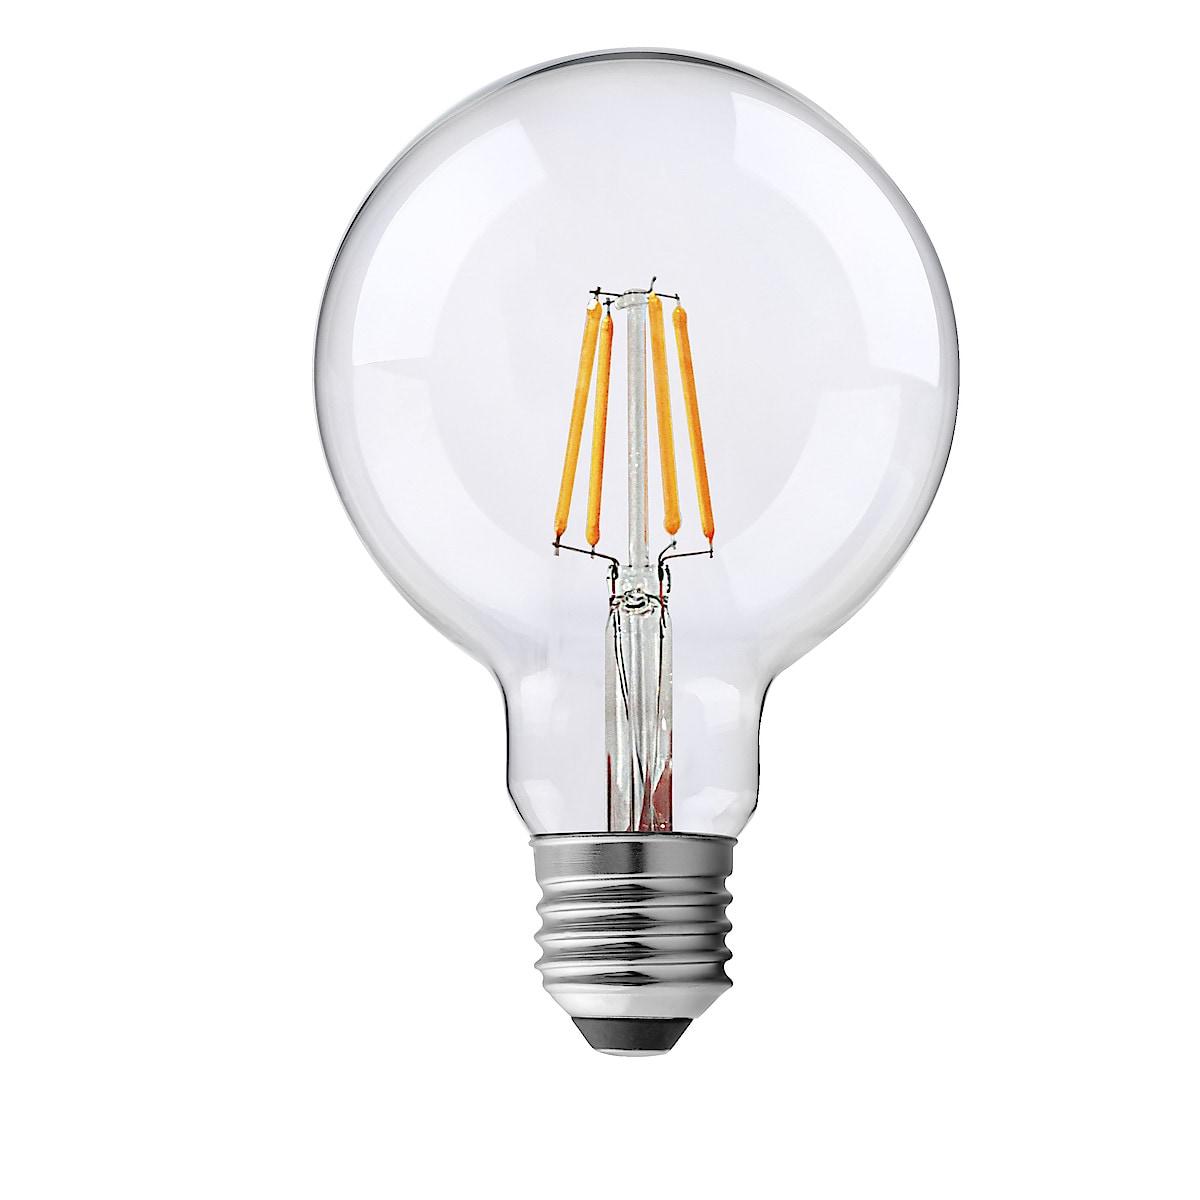 Dimbar dekorationslampa LED Glob Klar E27 Northlight